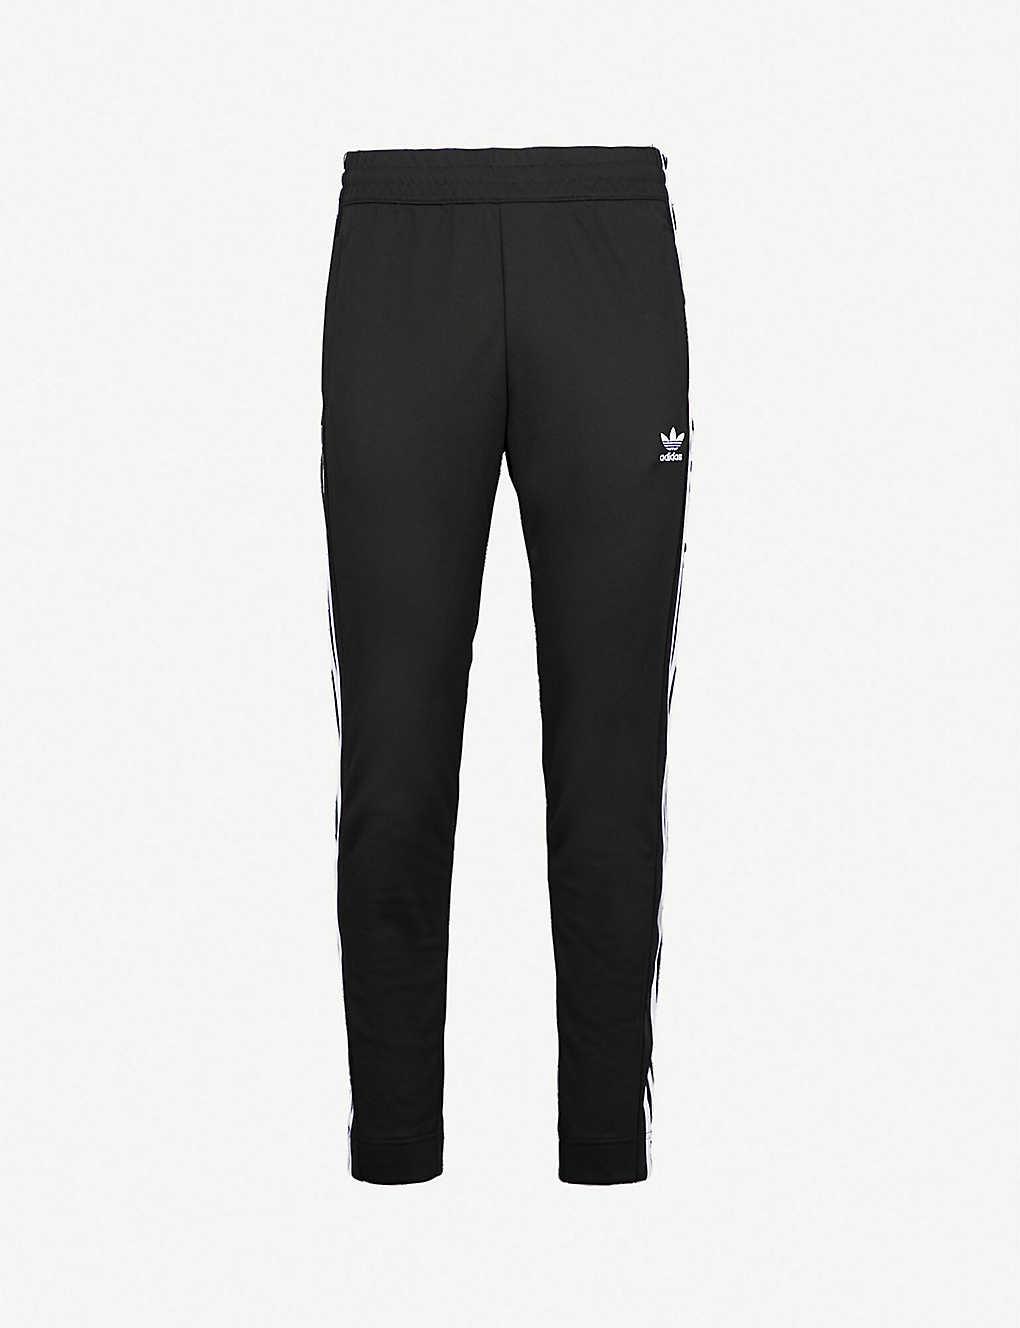 Jersey Jogging Snap Adidas Sports Bottoms Fastening MGSzqVpU